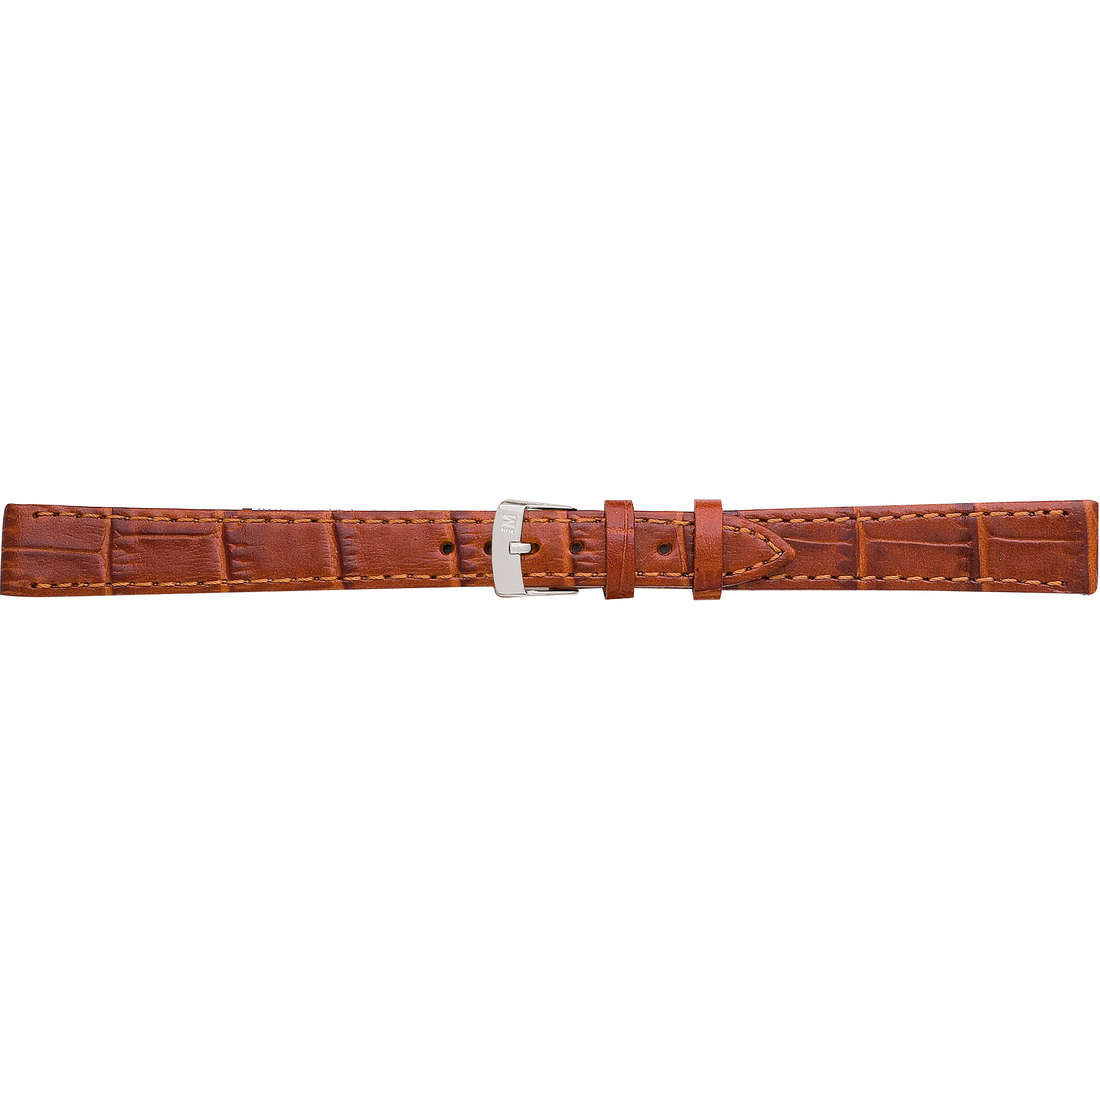 watch watch bands watch straps unisex Morellato I Lunghi A01Y2524656041CR14